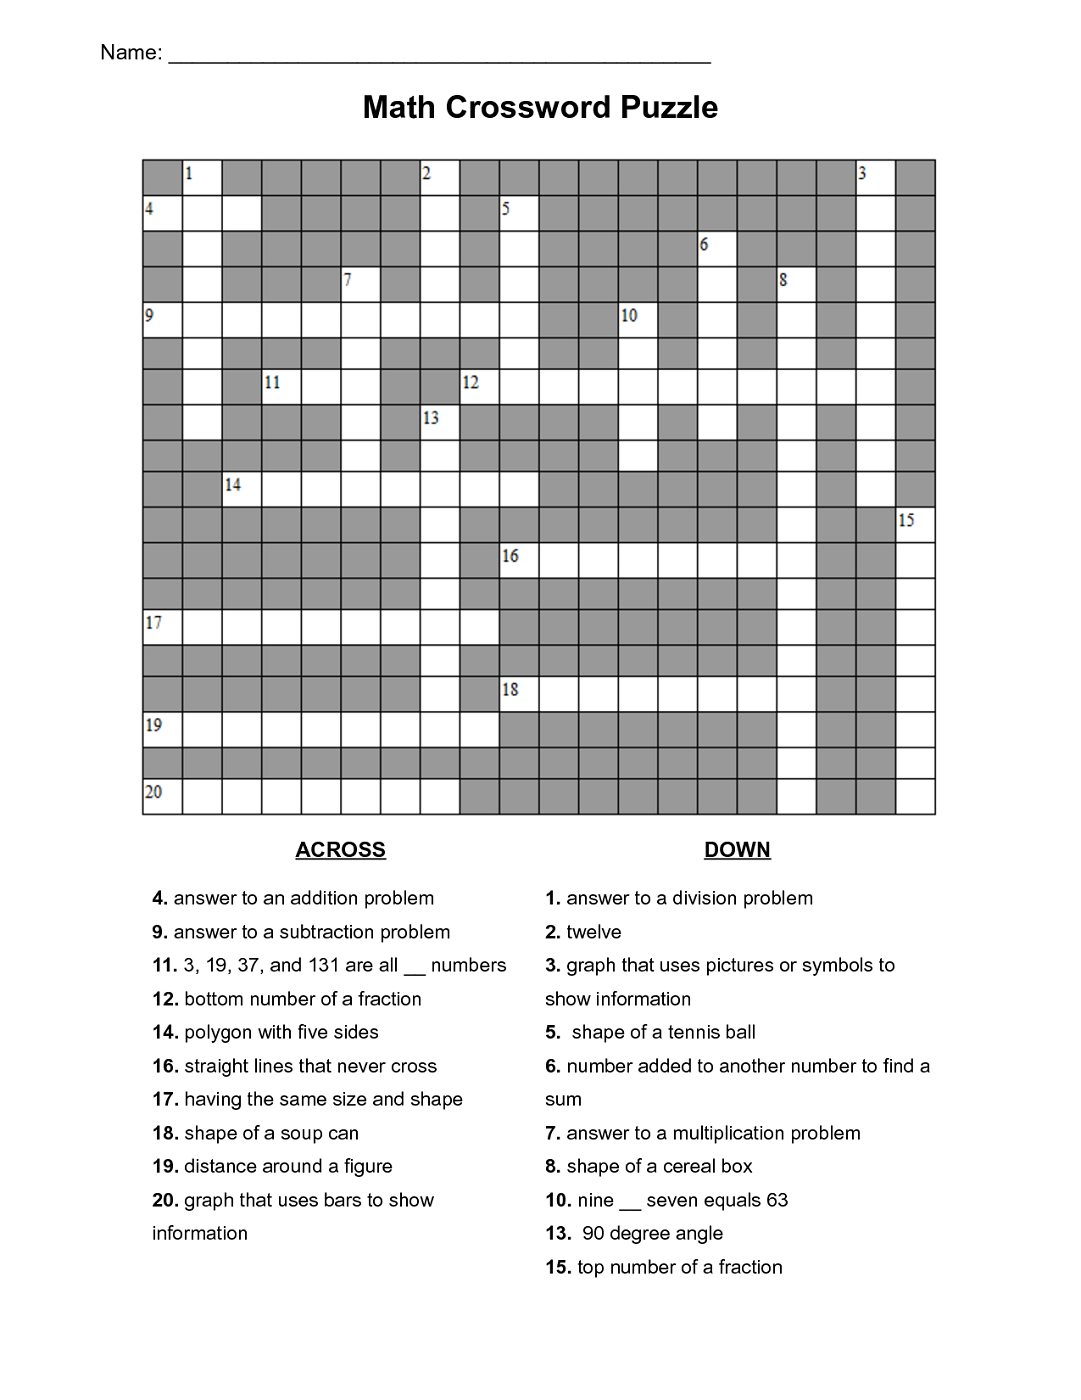 Maths Puzzles For Kids Crossword | Activities | Maths Puzzles, Kids - Free Printable Crossword Puzzle #7 Answers